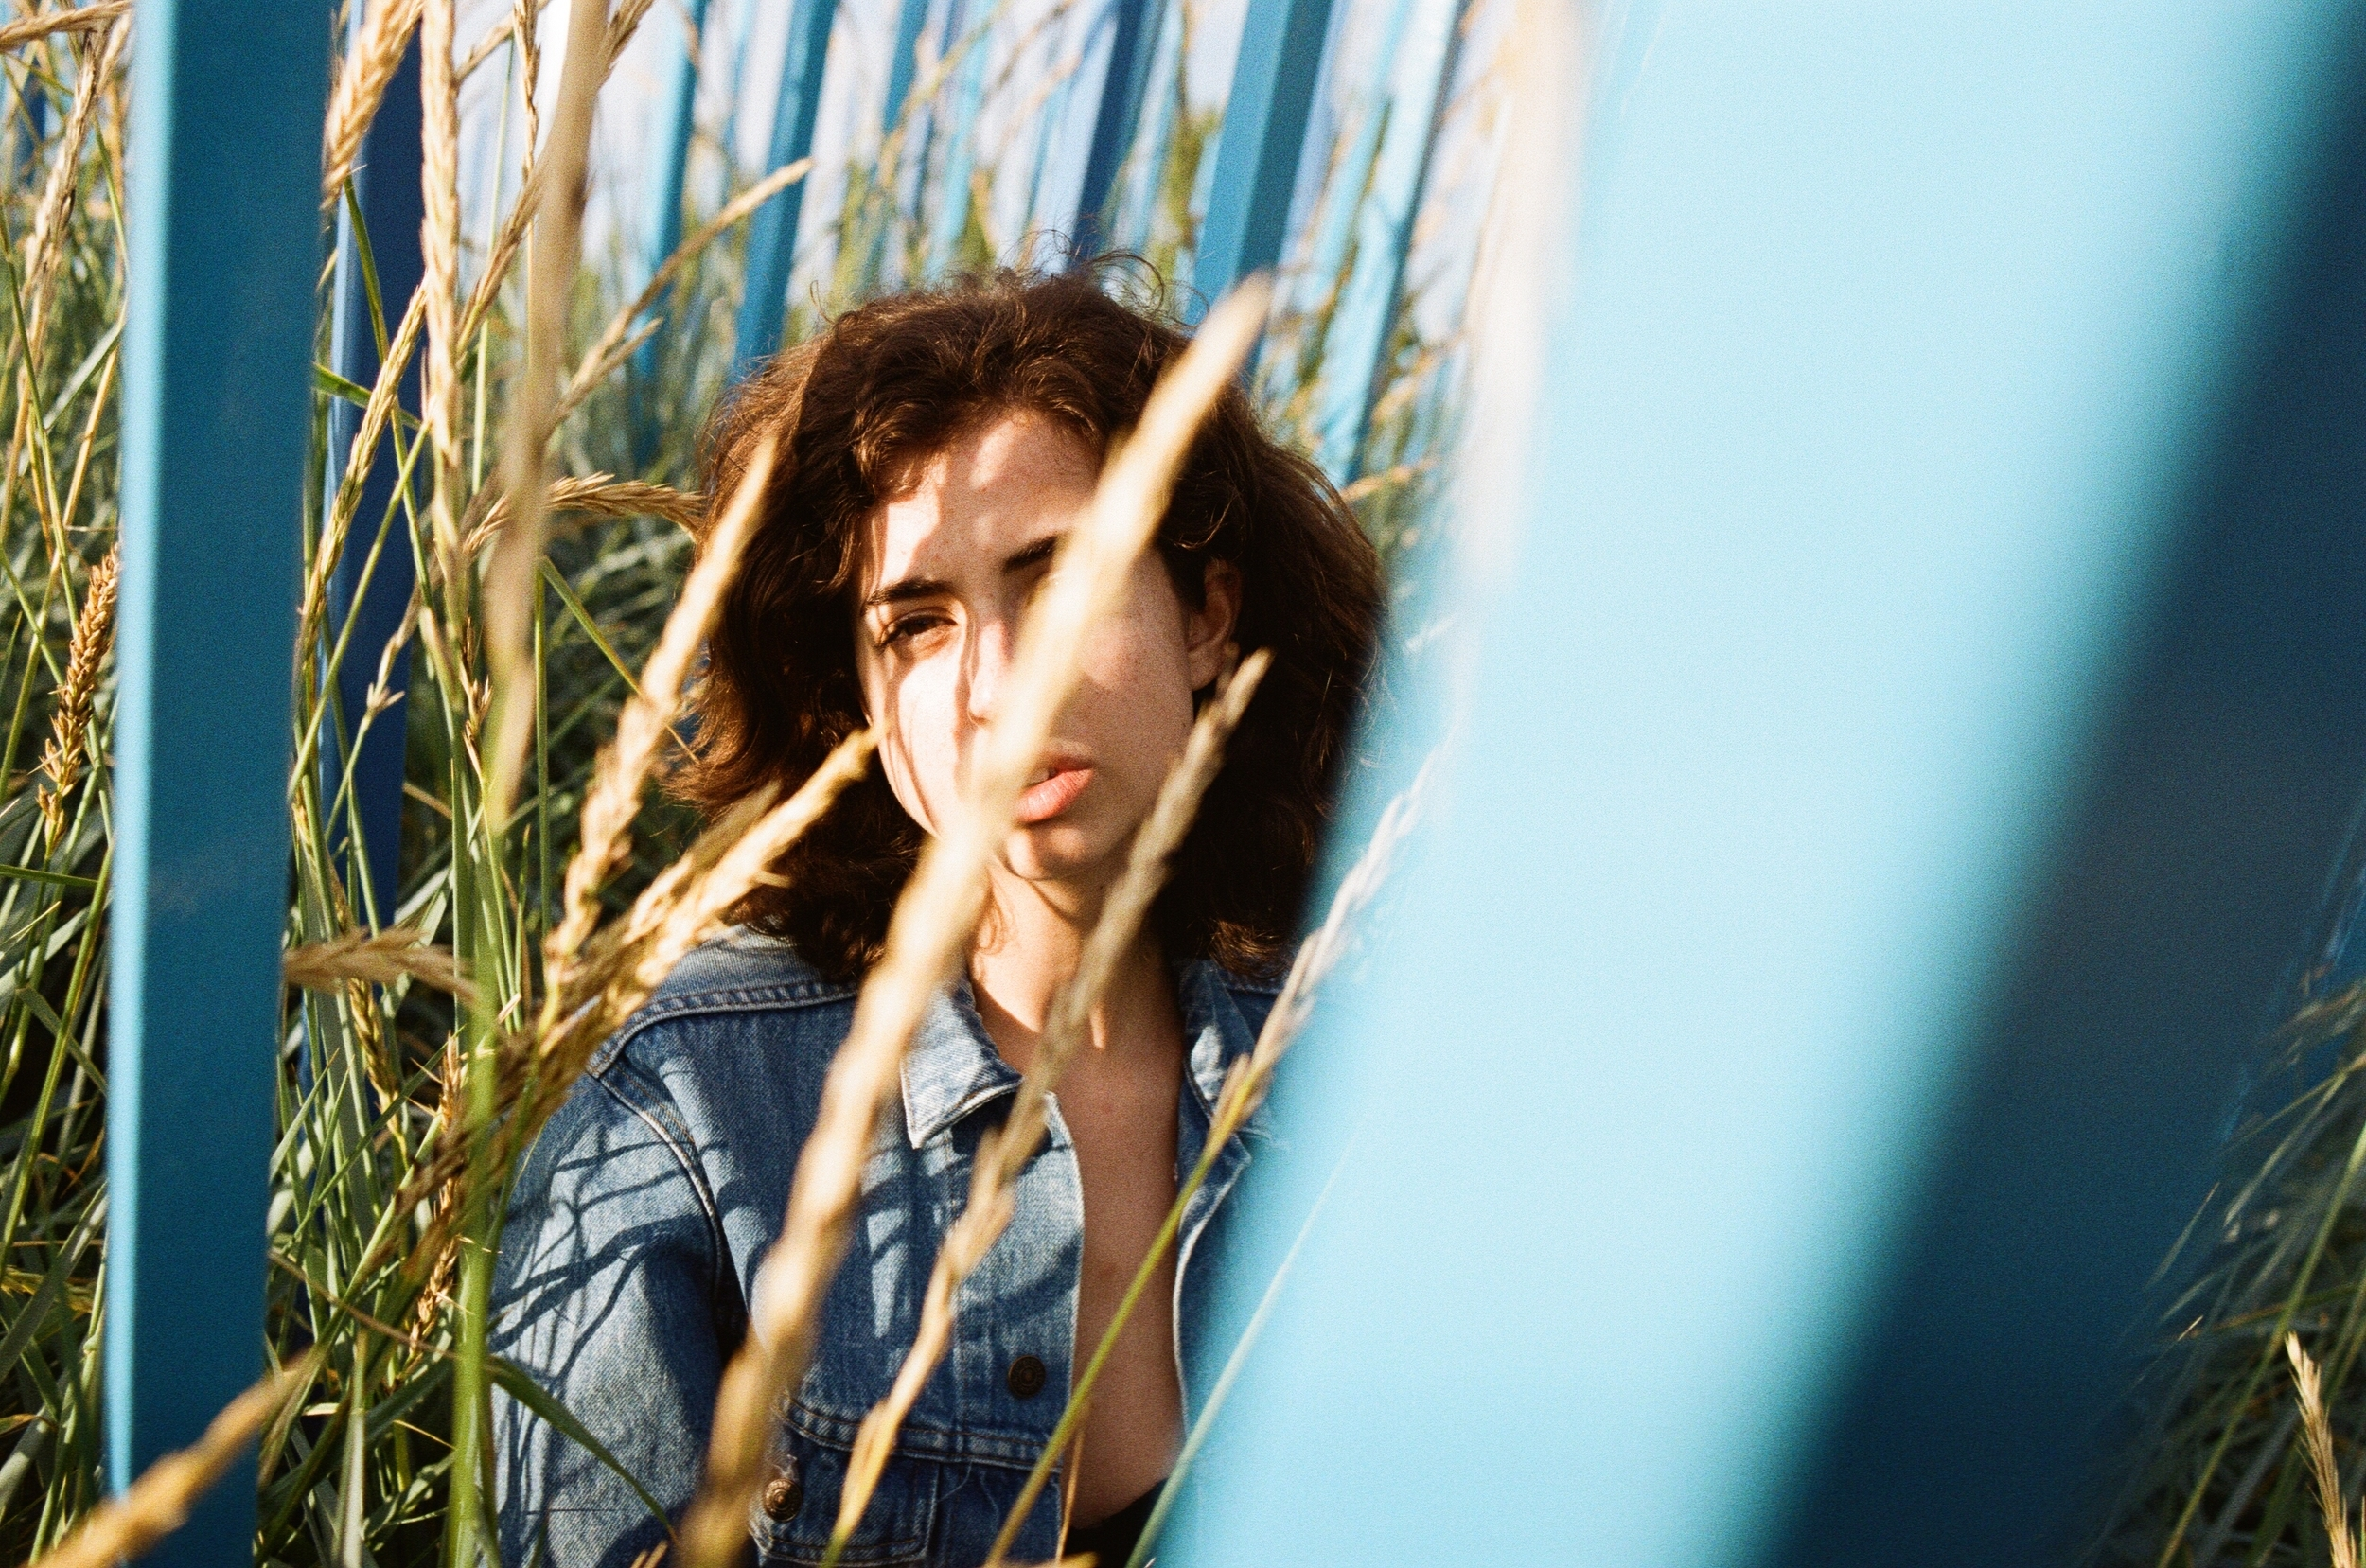 bbblue: film portraits by pam lau